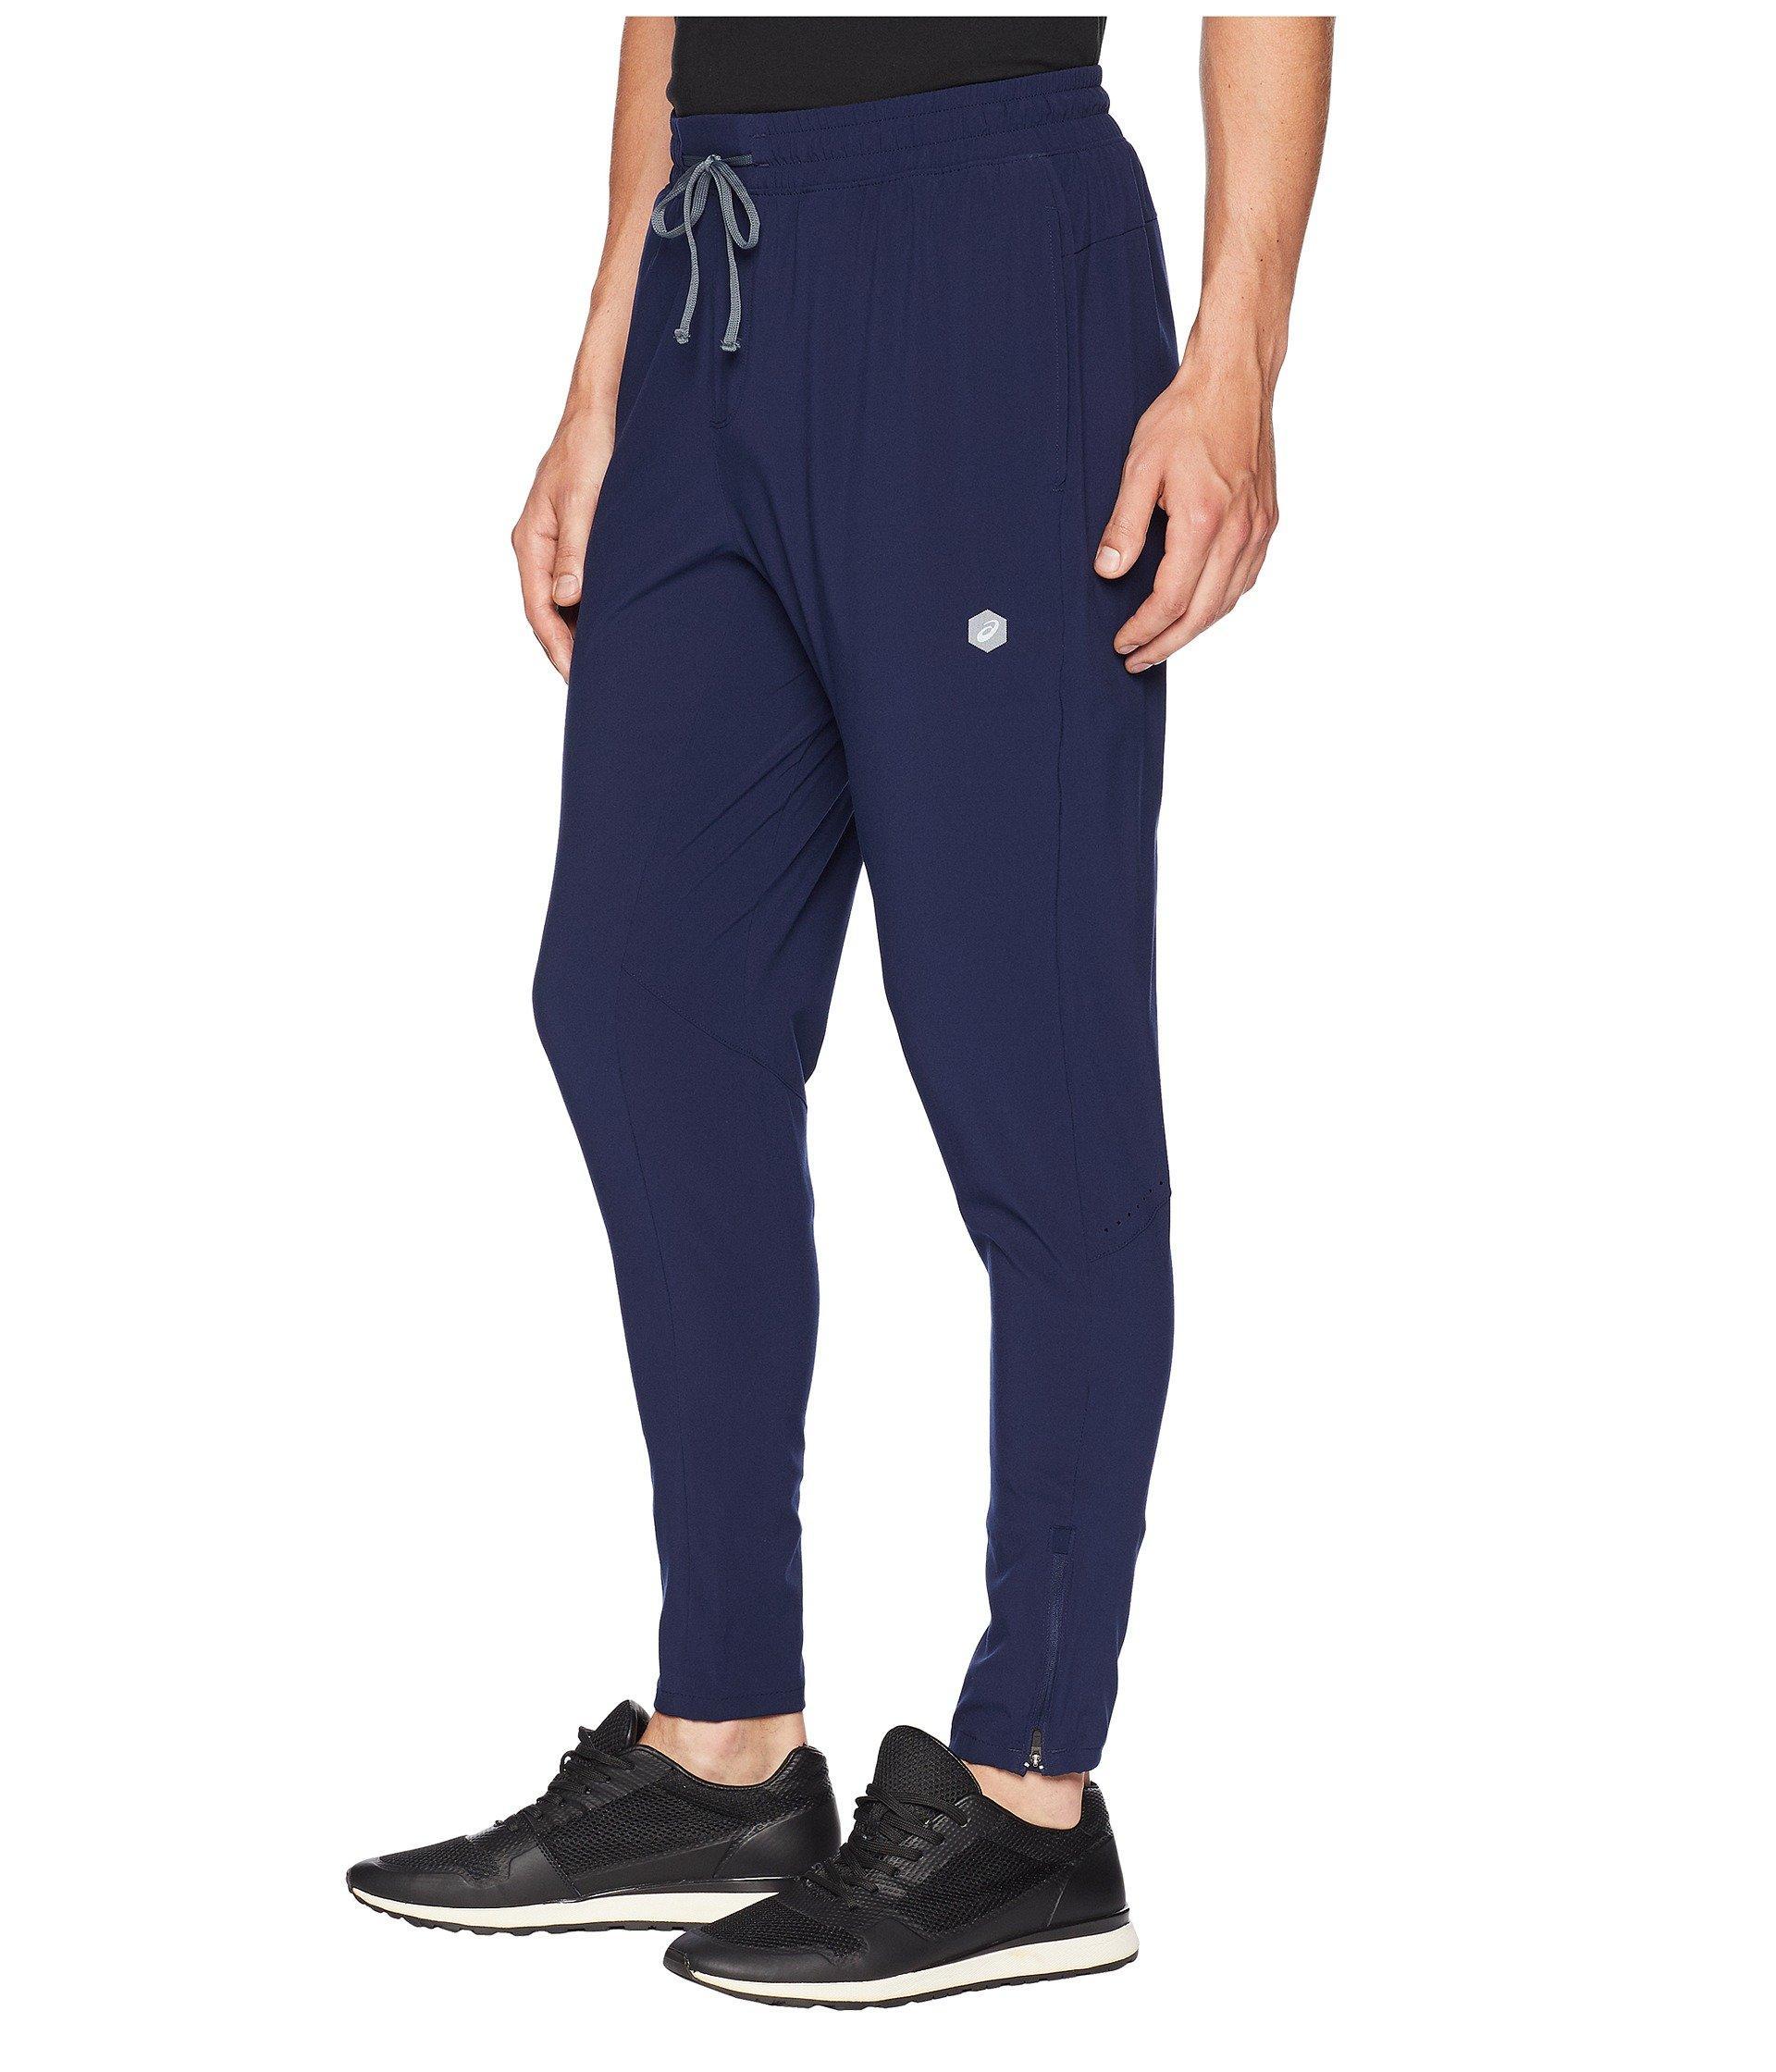 b7eacddd64fecf Lyst - Asics Run Woven Track Pants in Blue for Men